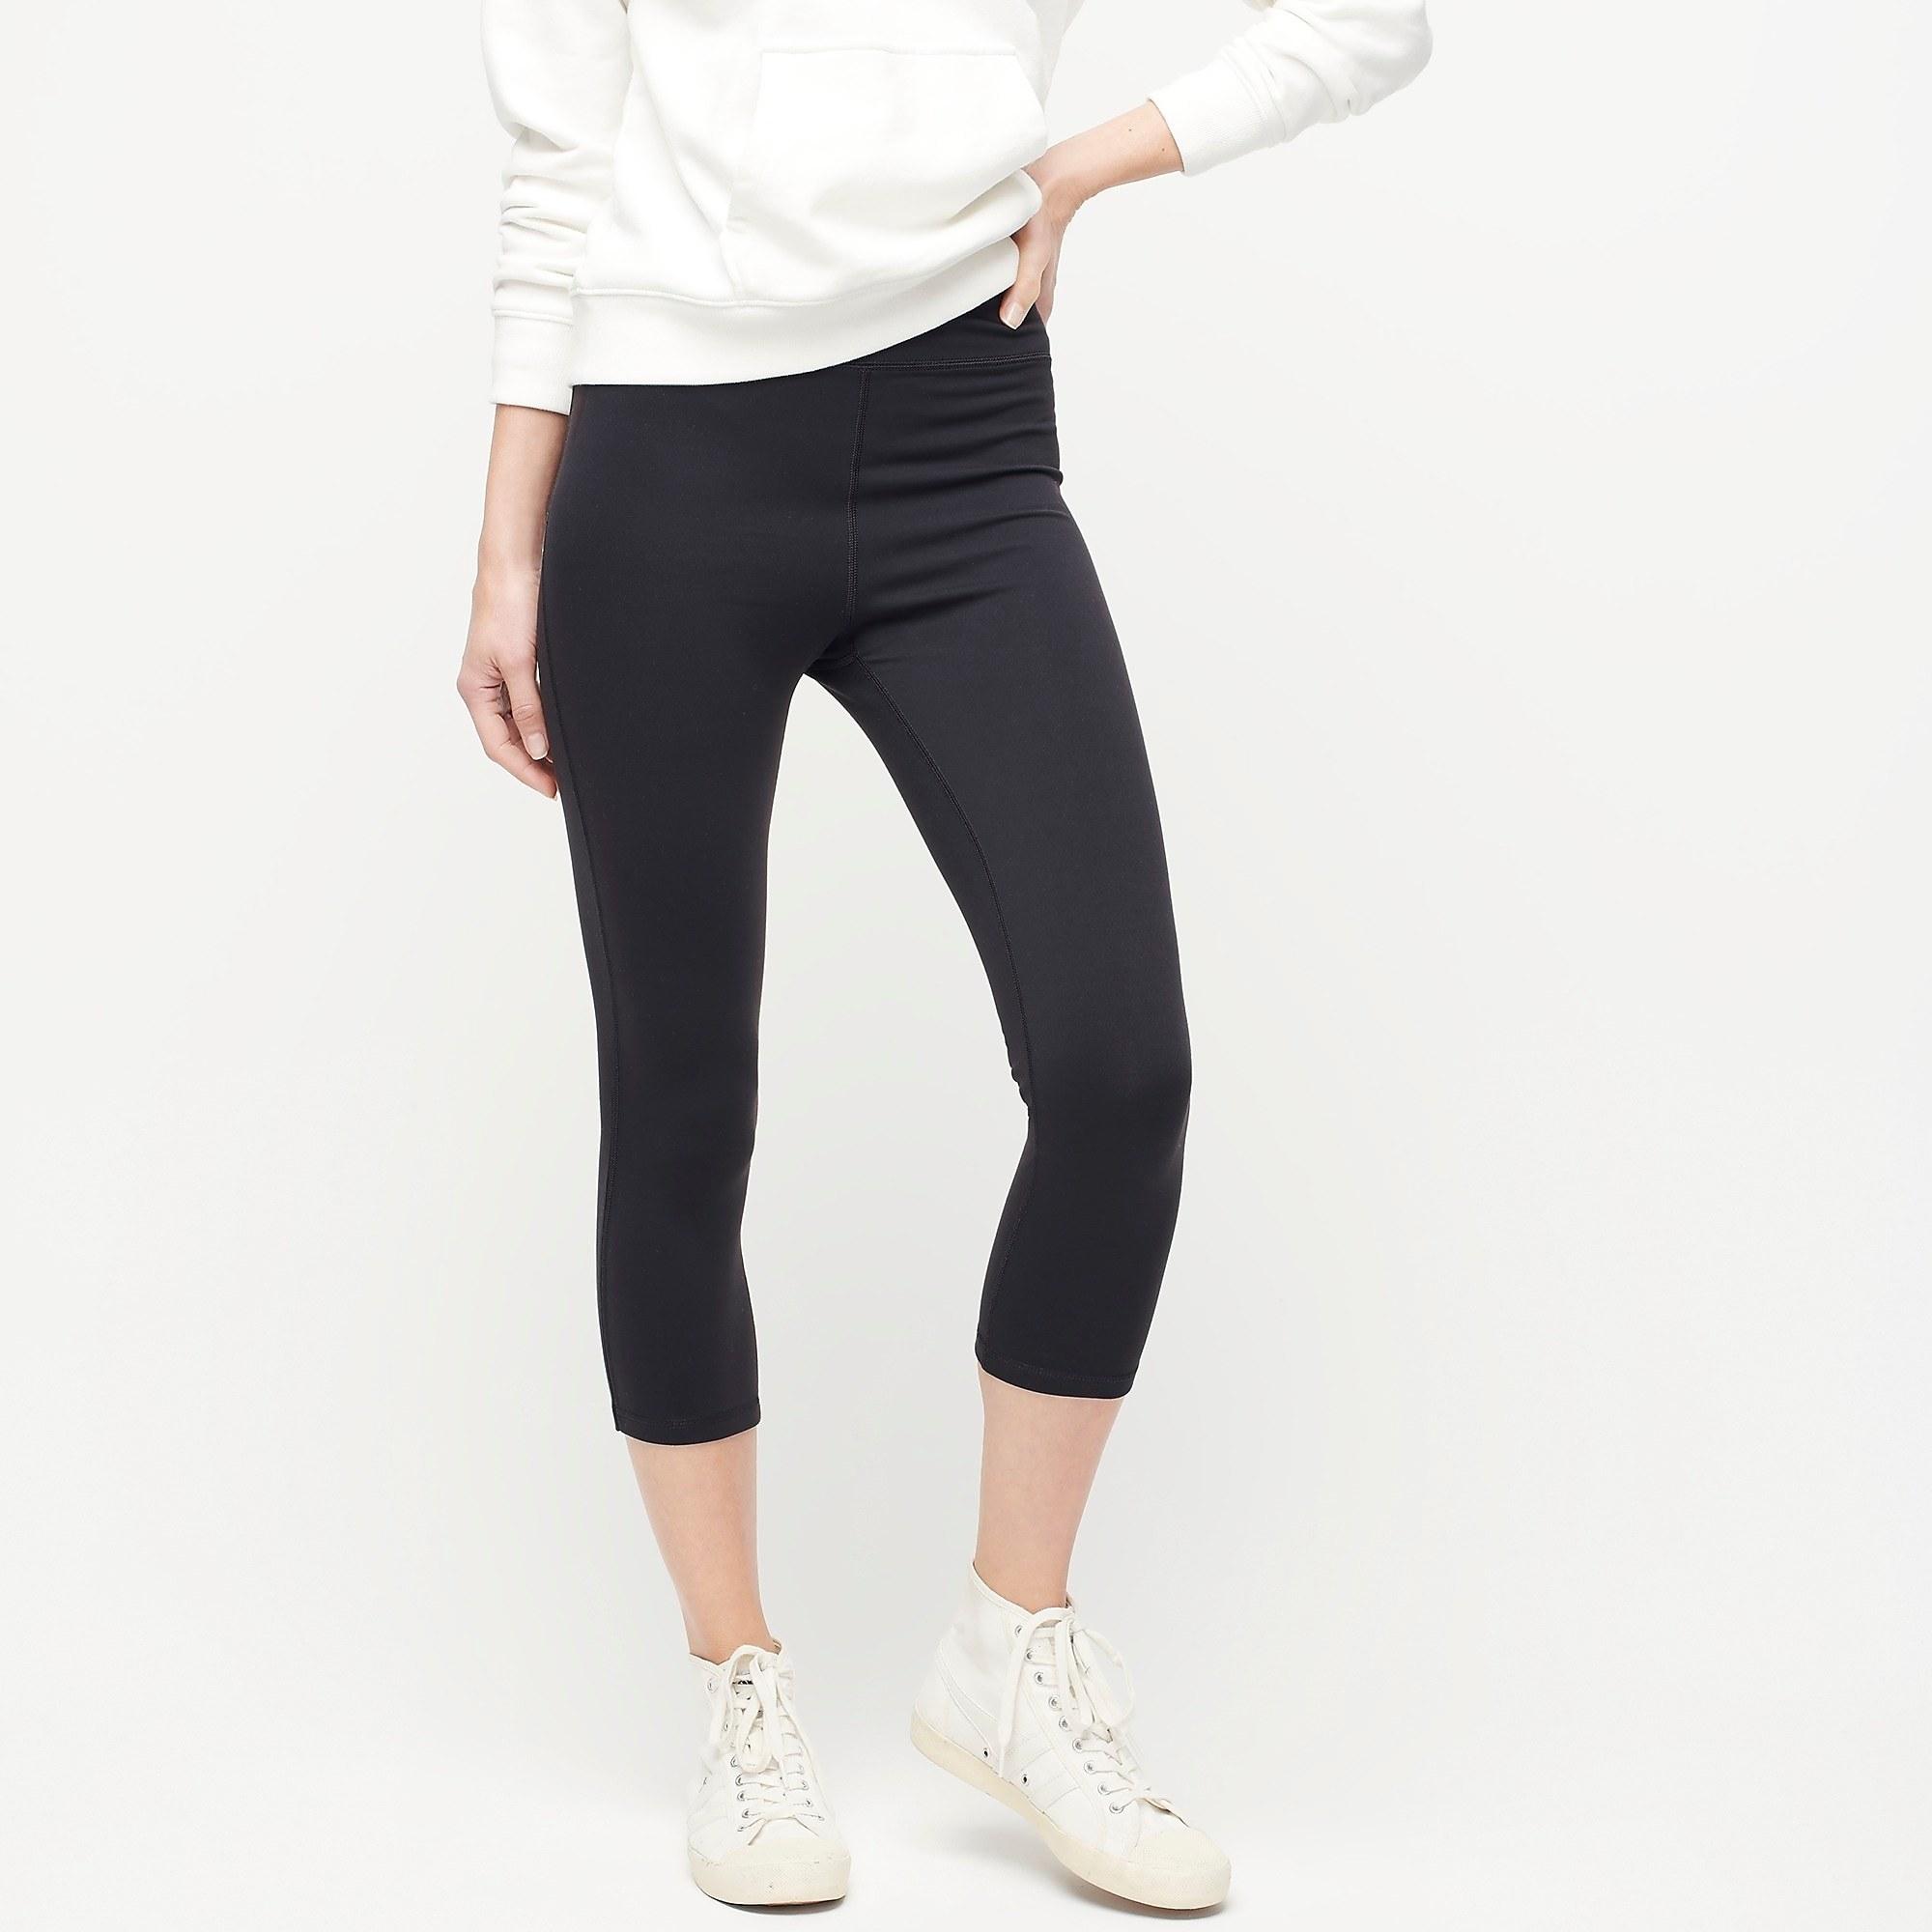 model in black cropped leggings